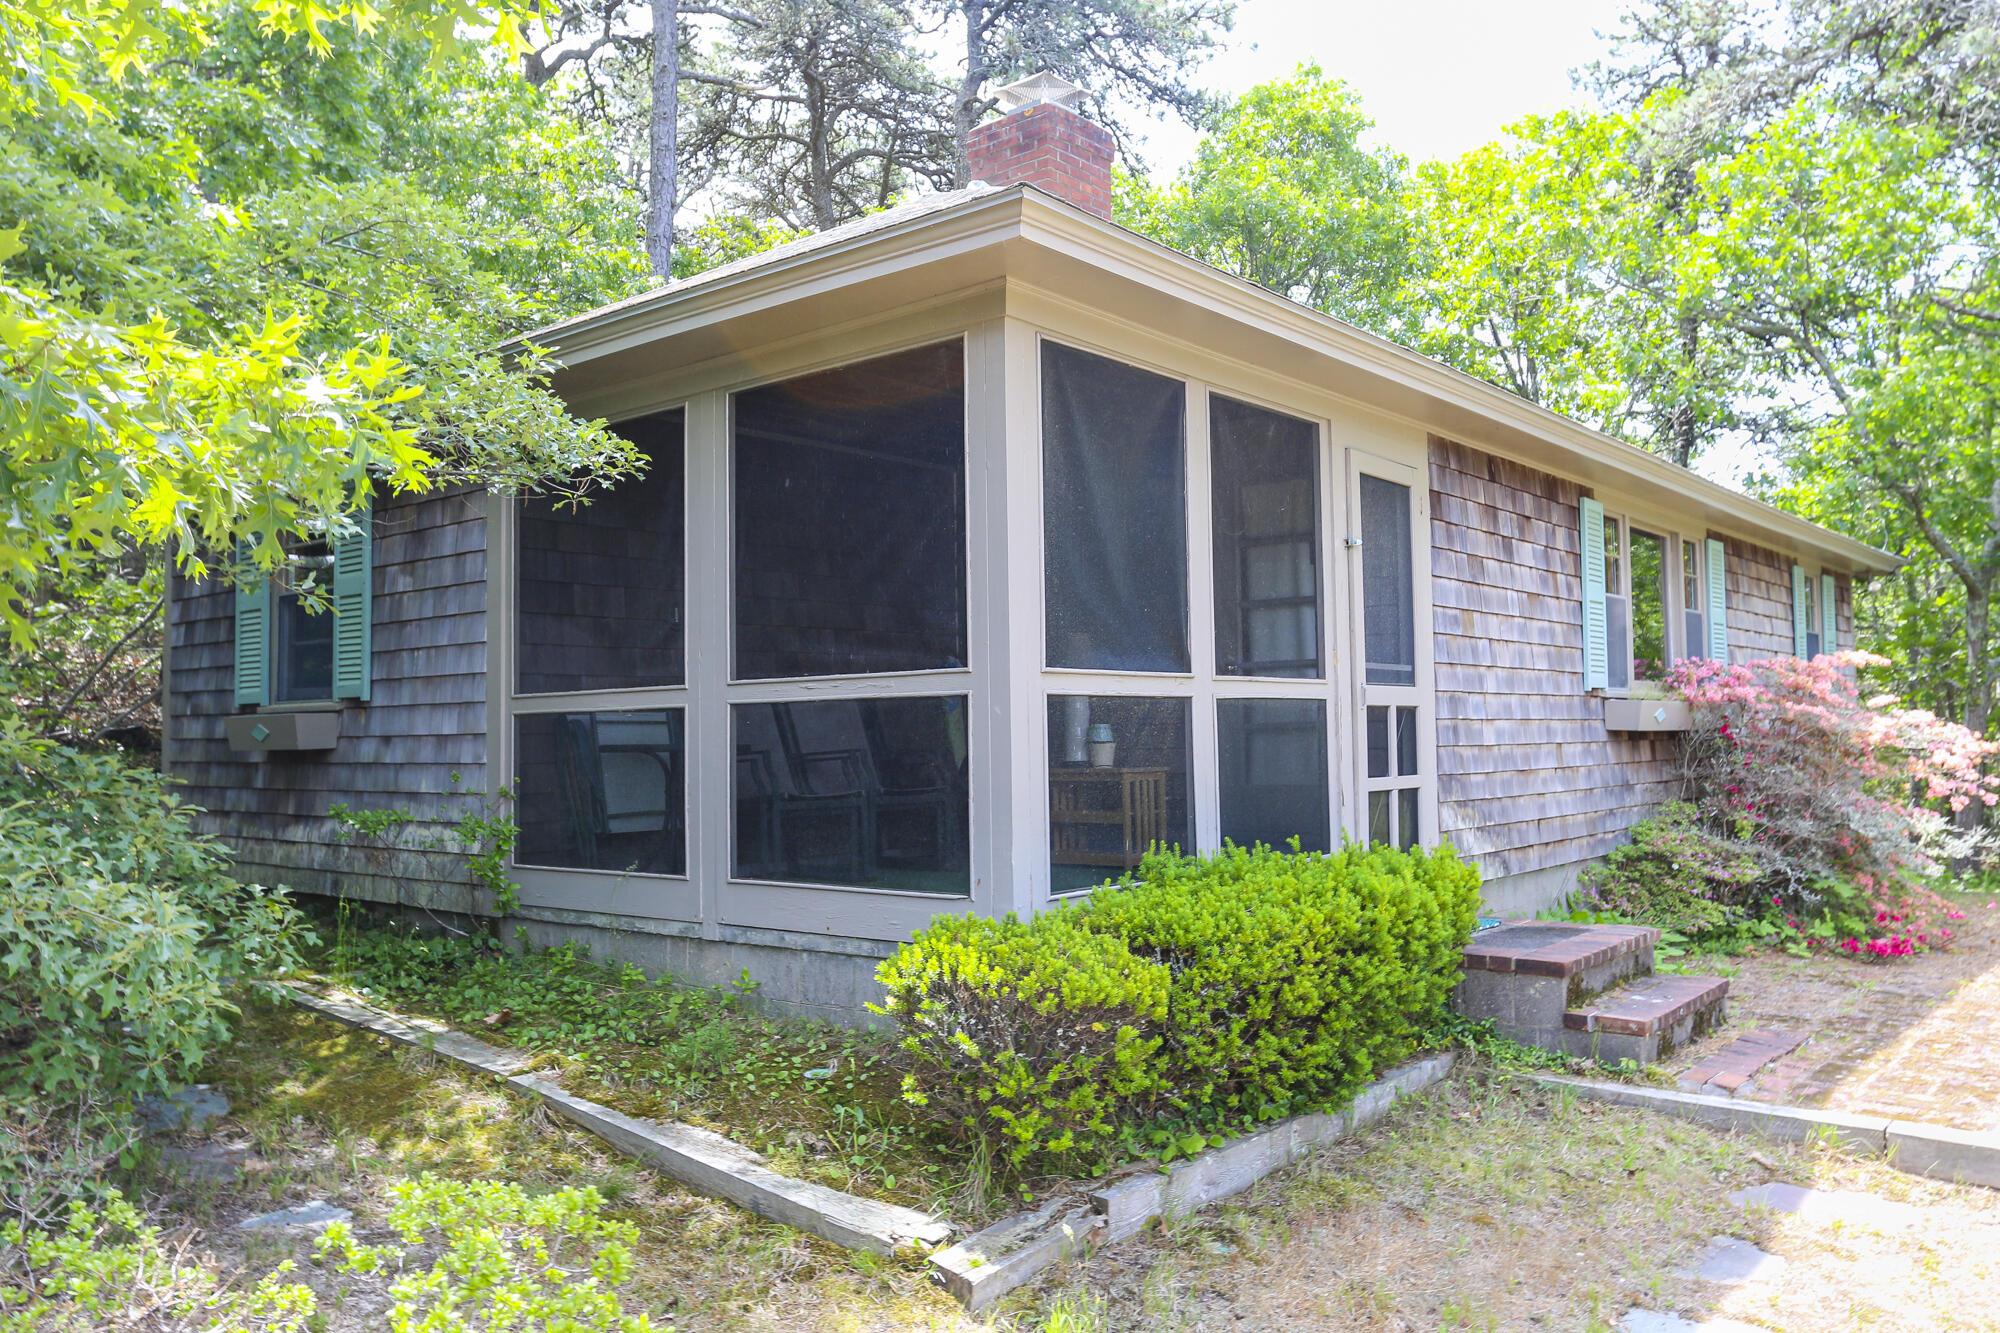 117 Bucks Creek Road, Chatham MA, 02633 - slide 8